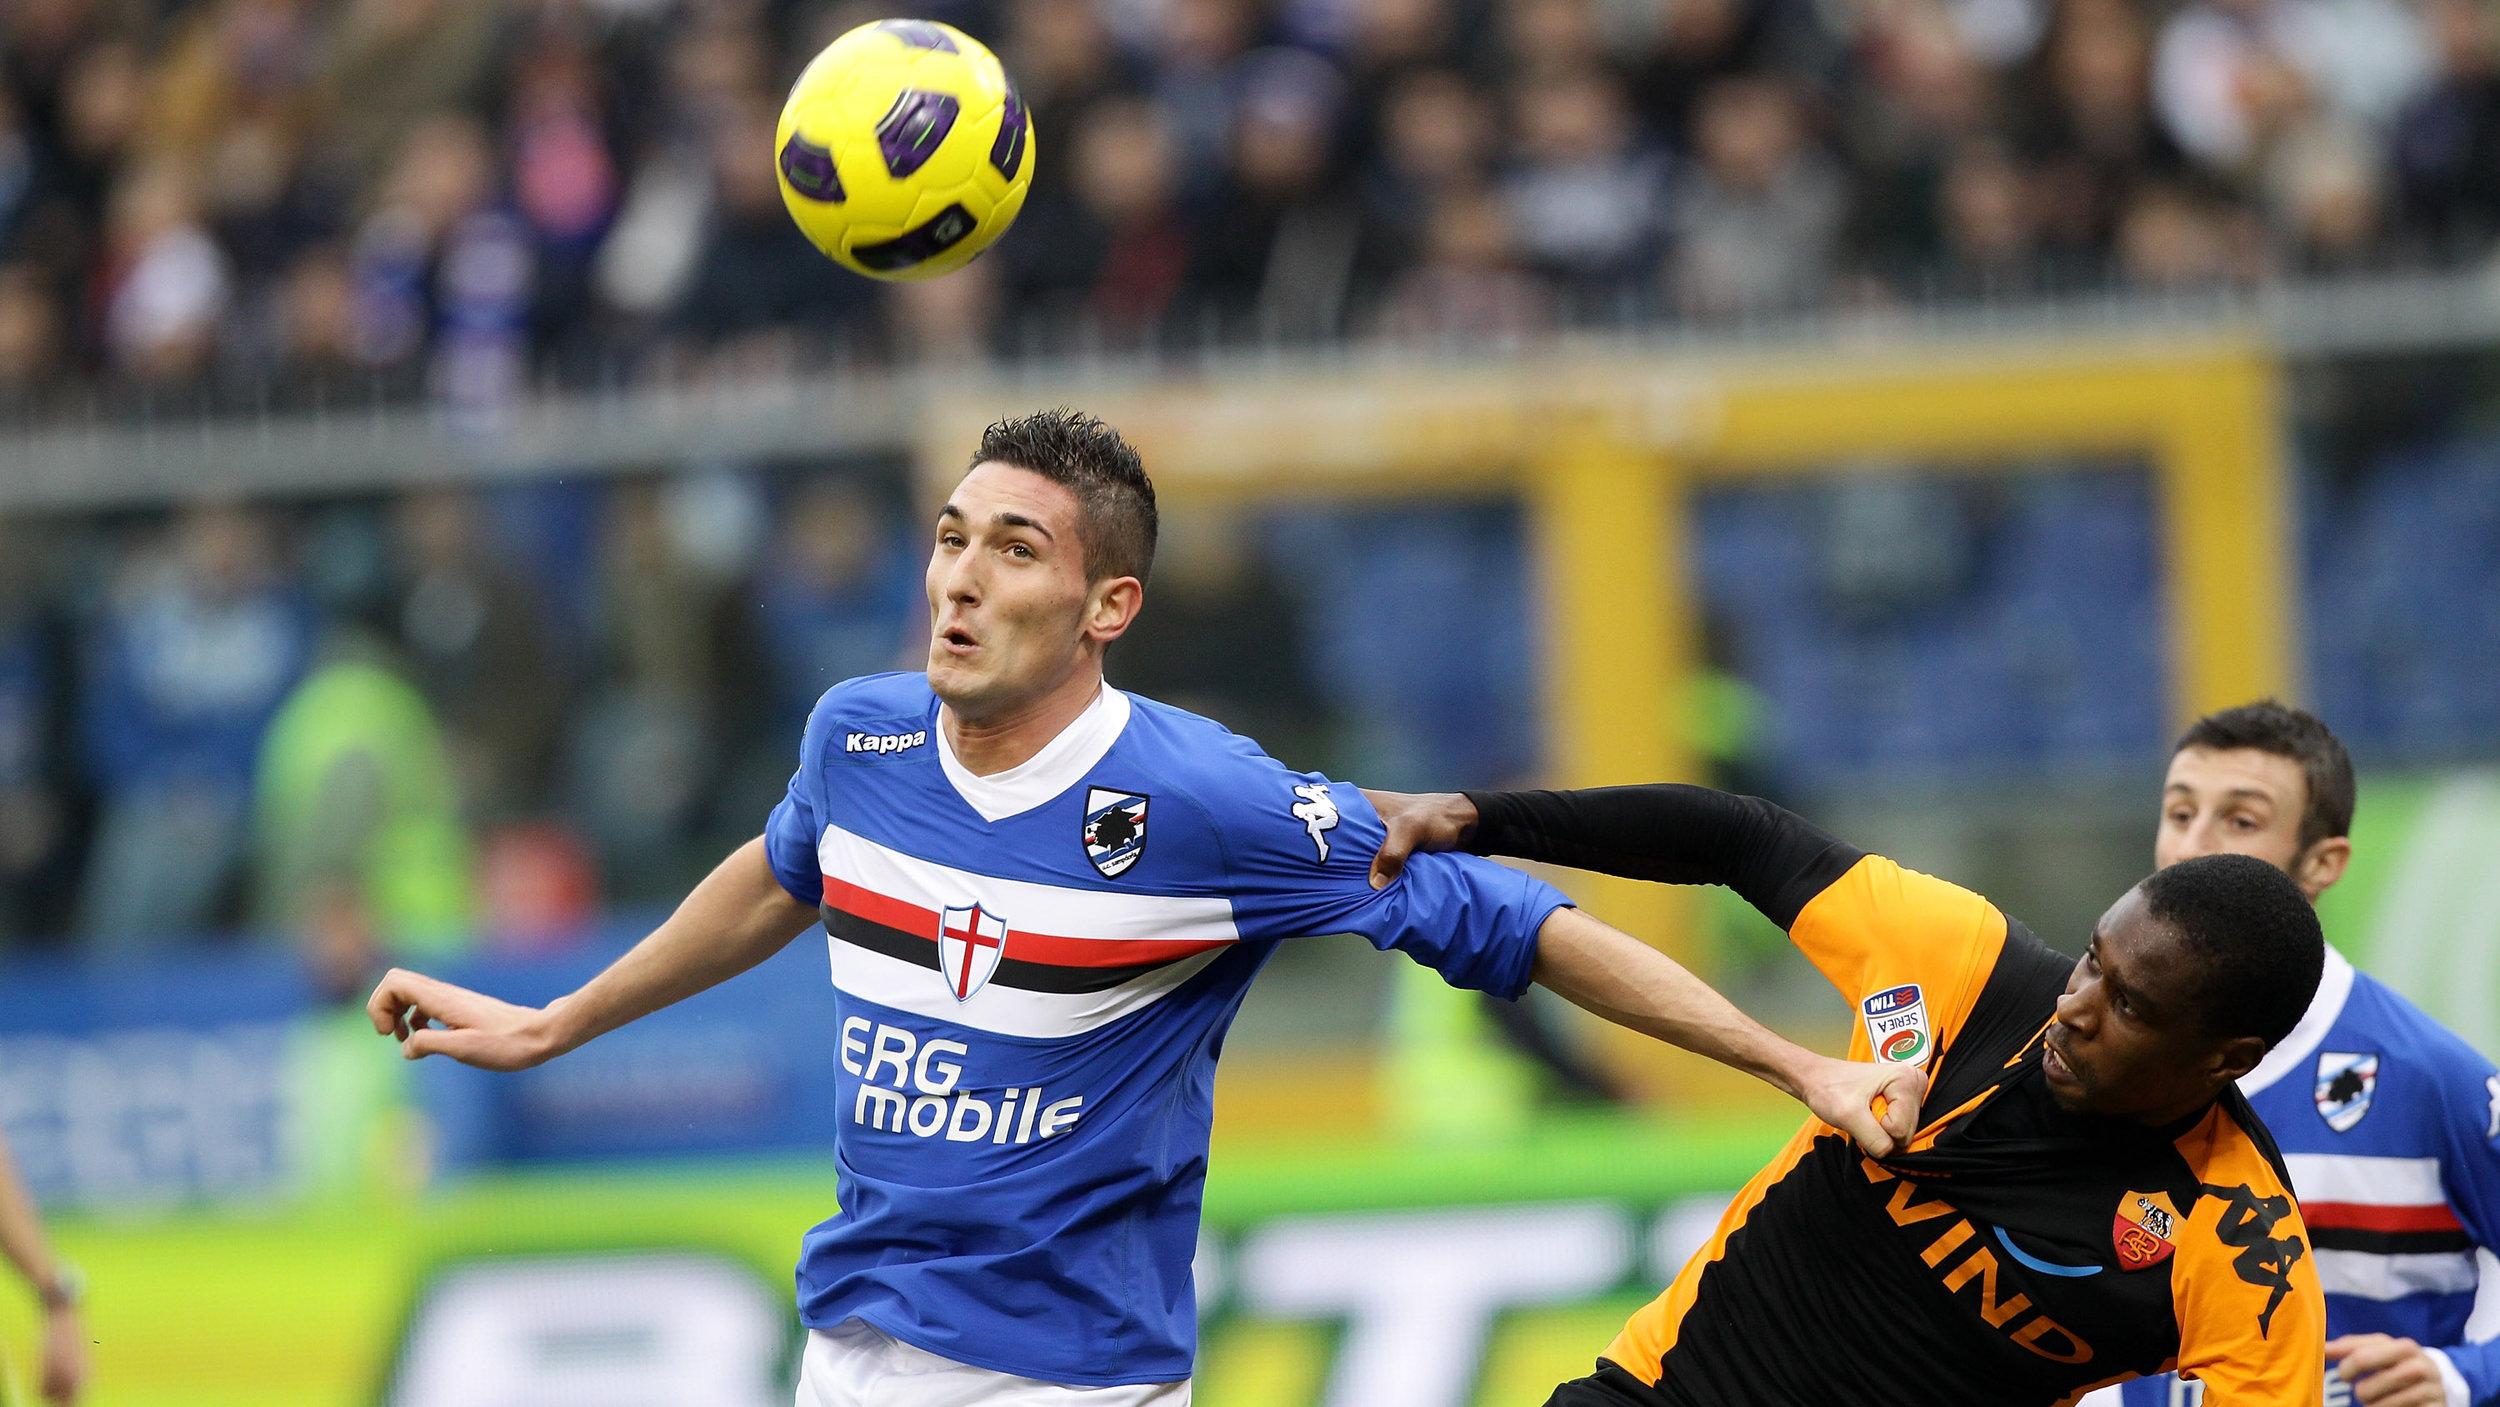 AGONA Scouting Report: Who is New Panathinaikos Striker Federico Macheda —  AGONAsport.com